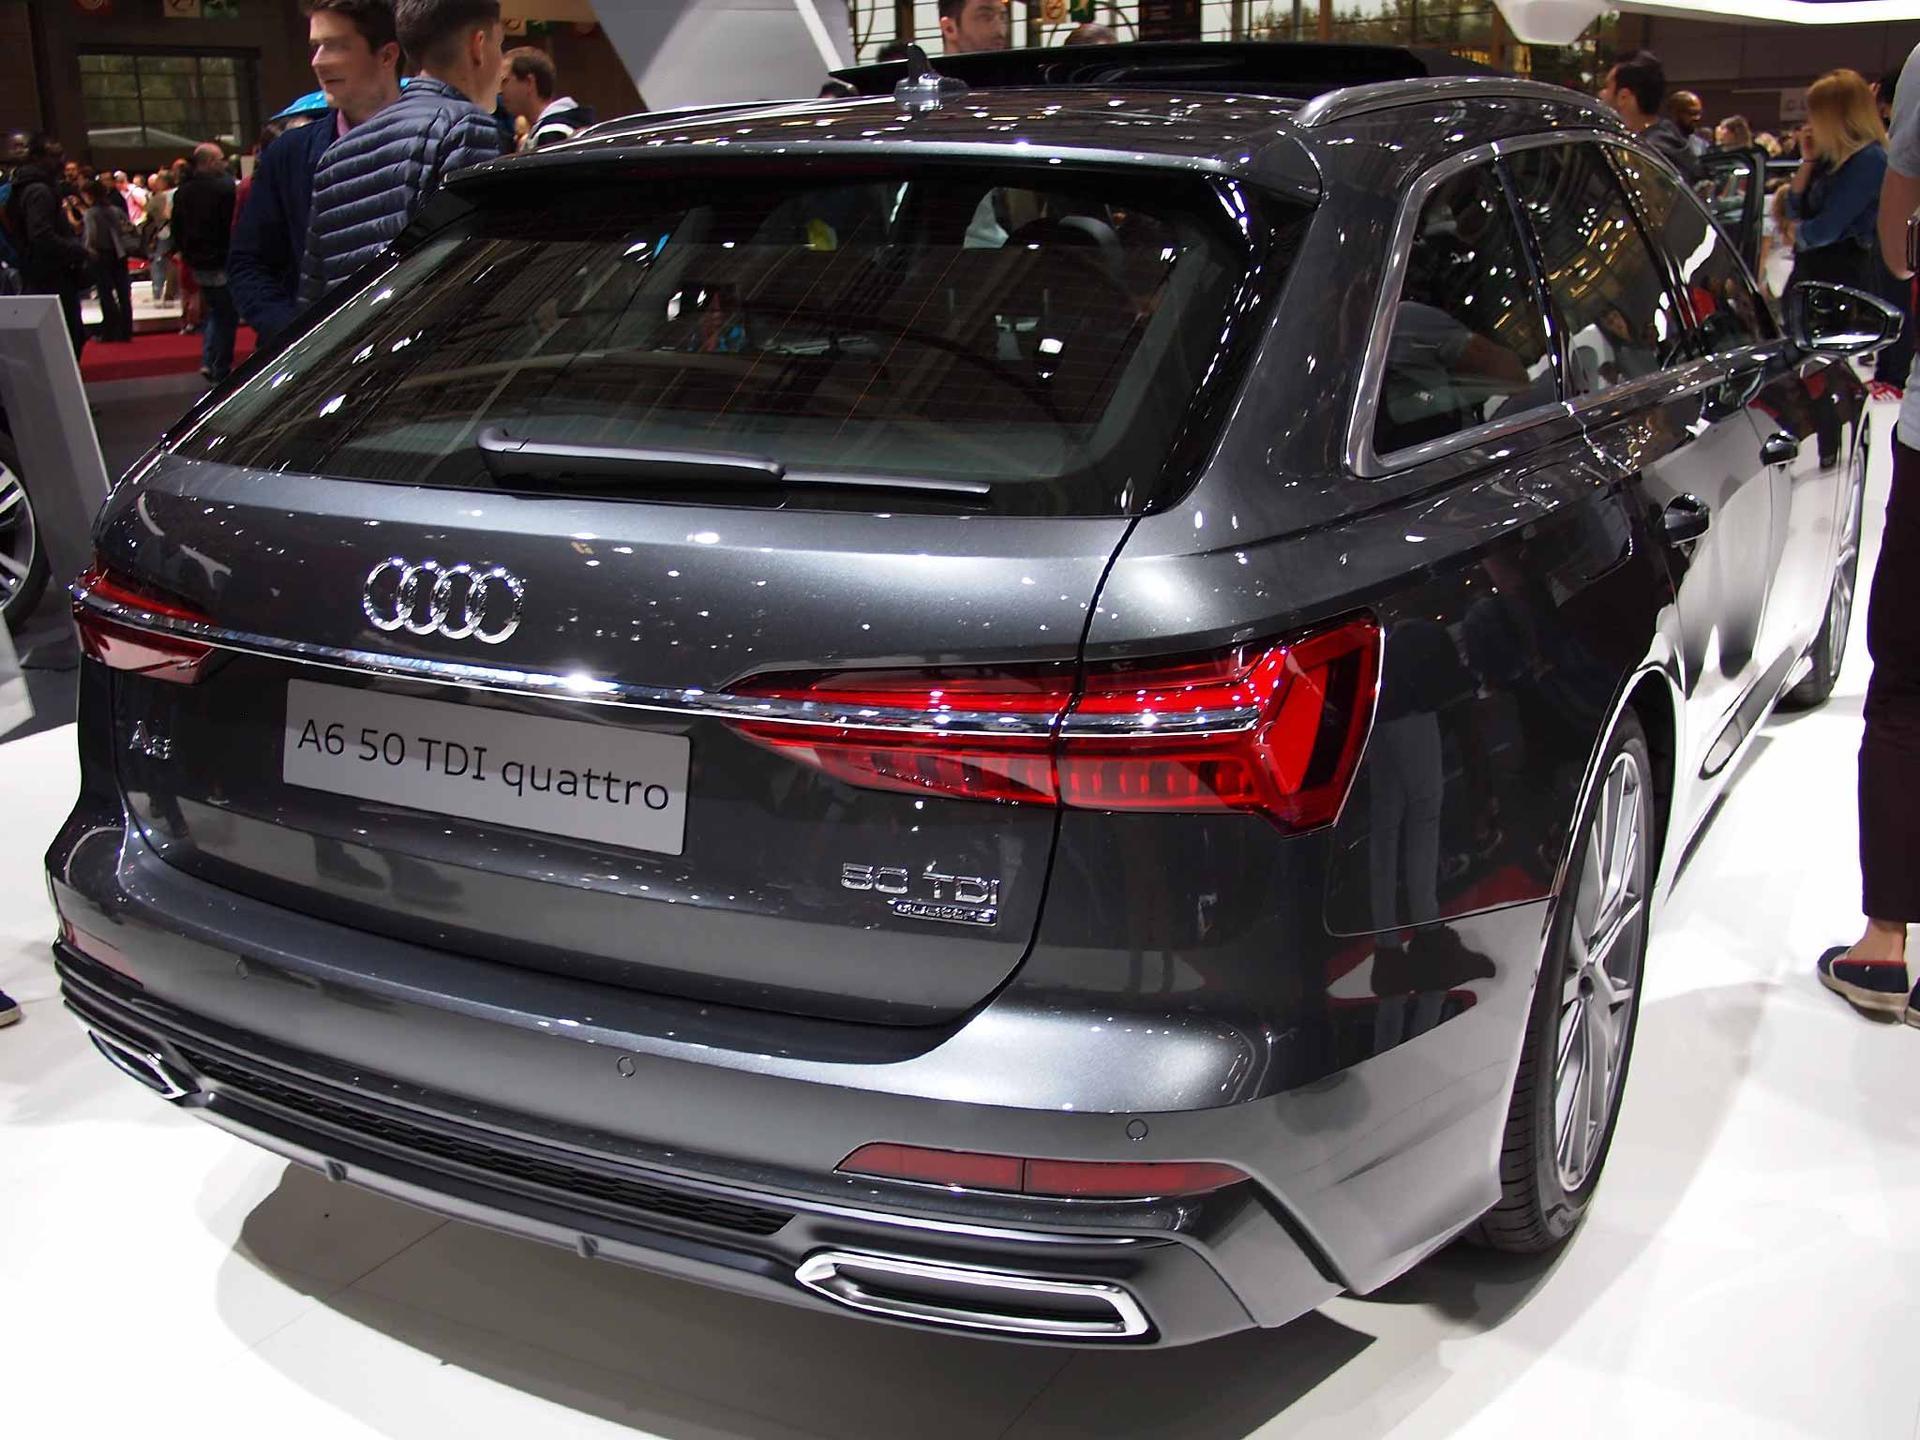 Audi A6 Avant 45 Tdi Quattro Tiptronic Neuwagenrabatt Beste